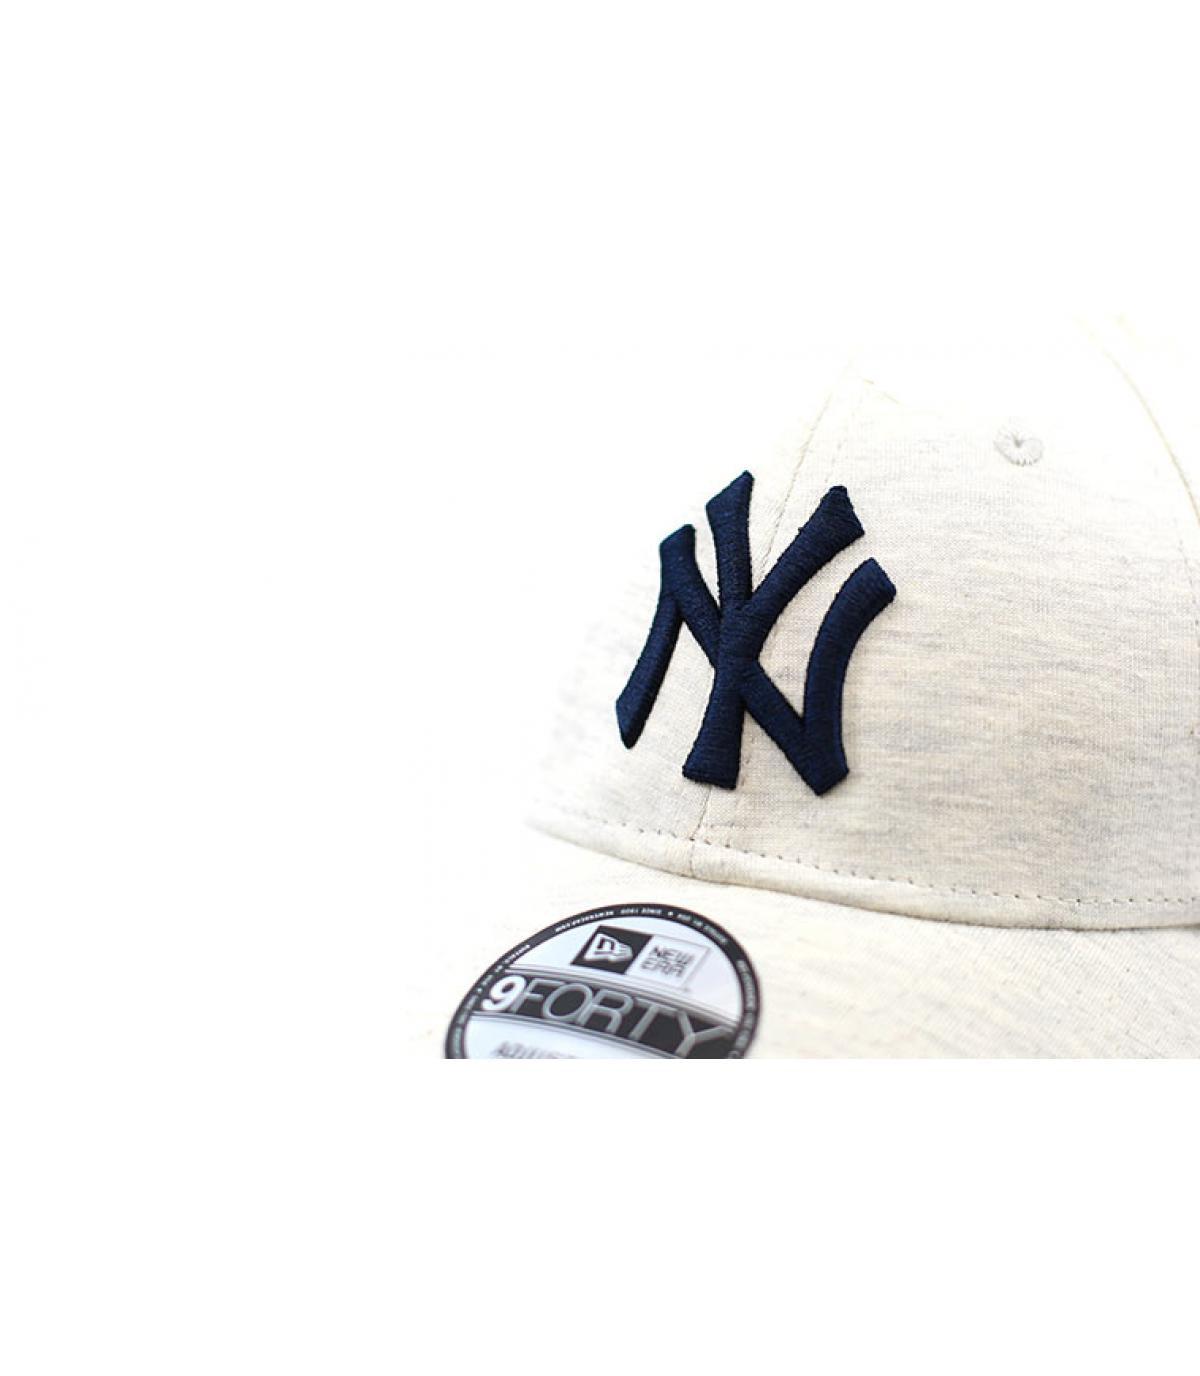 Dettagli Jersey Ess NY white gray navy - image 3